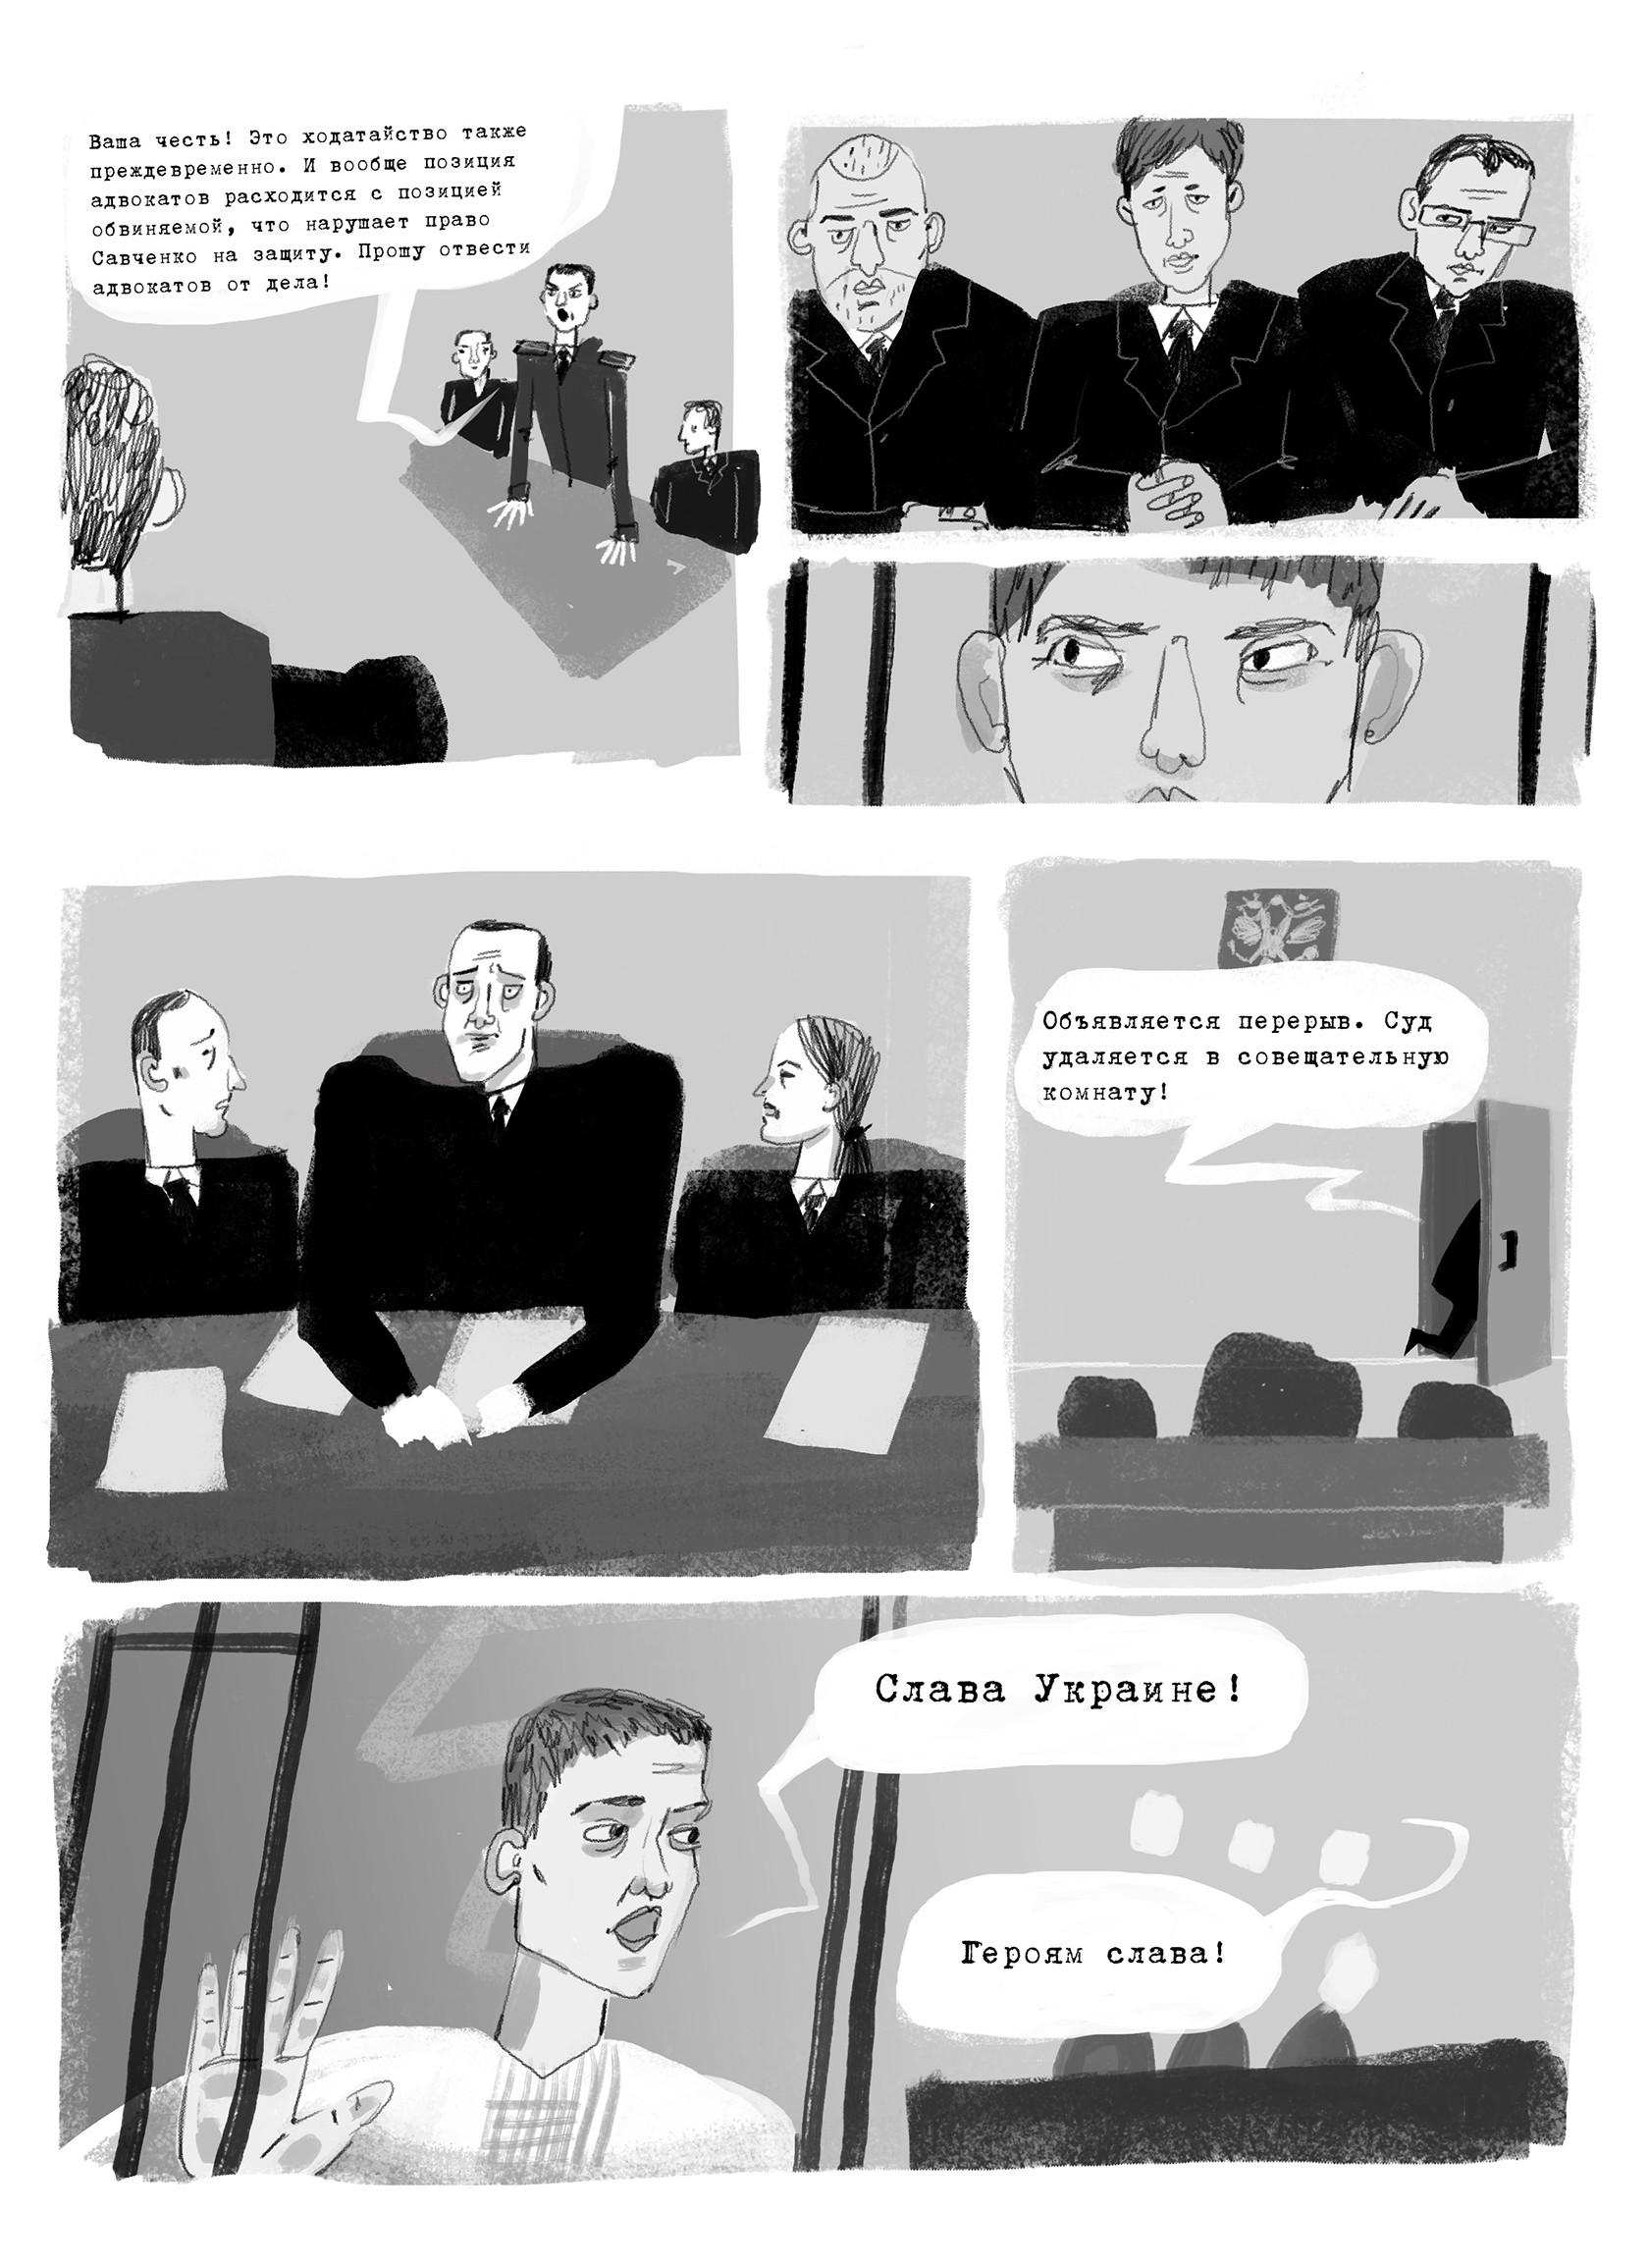 В Росії Савченко стала героїнею коміксу - фото 3